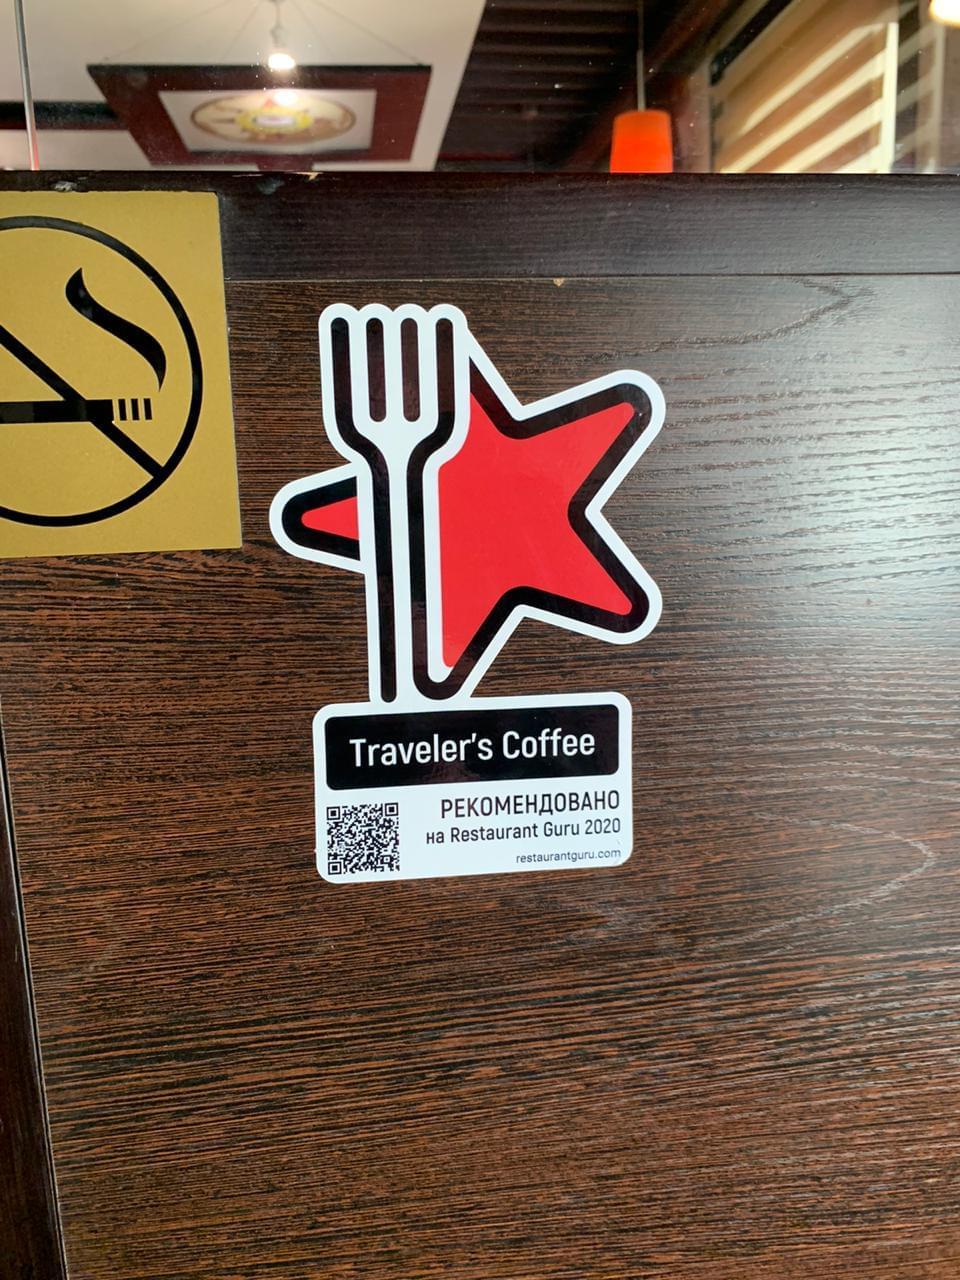 Traveler's Coffee award